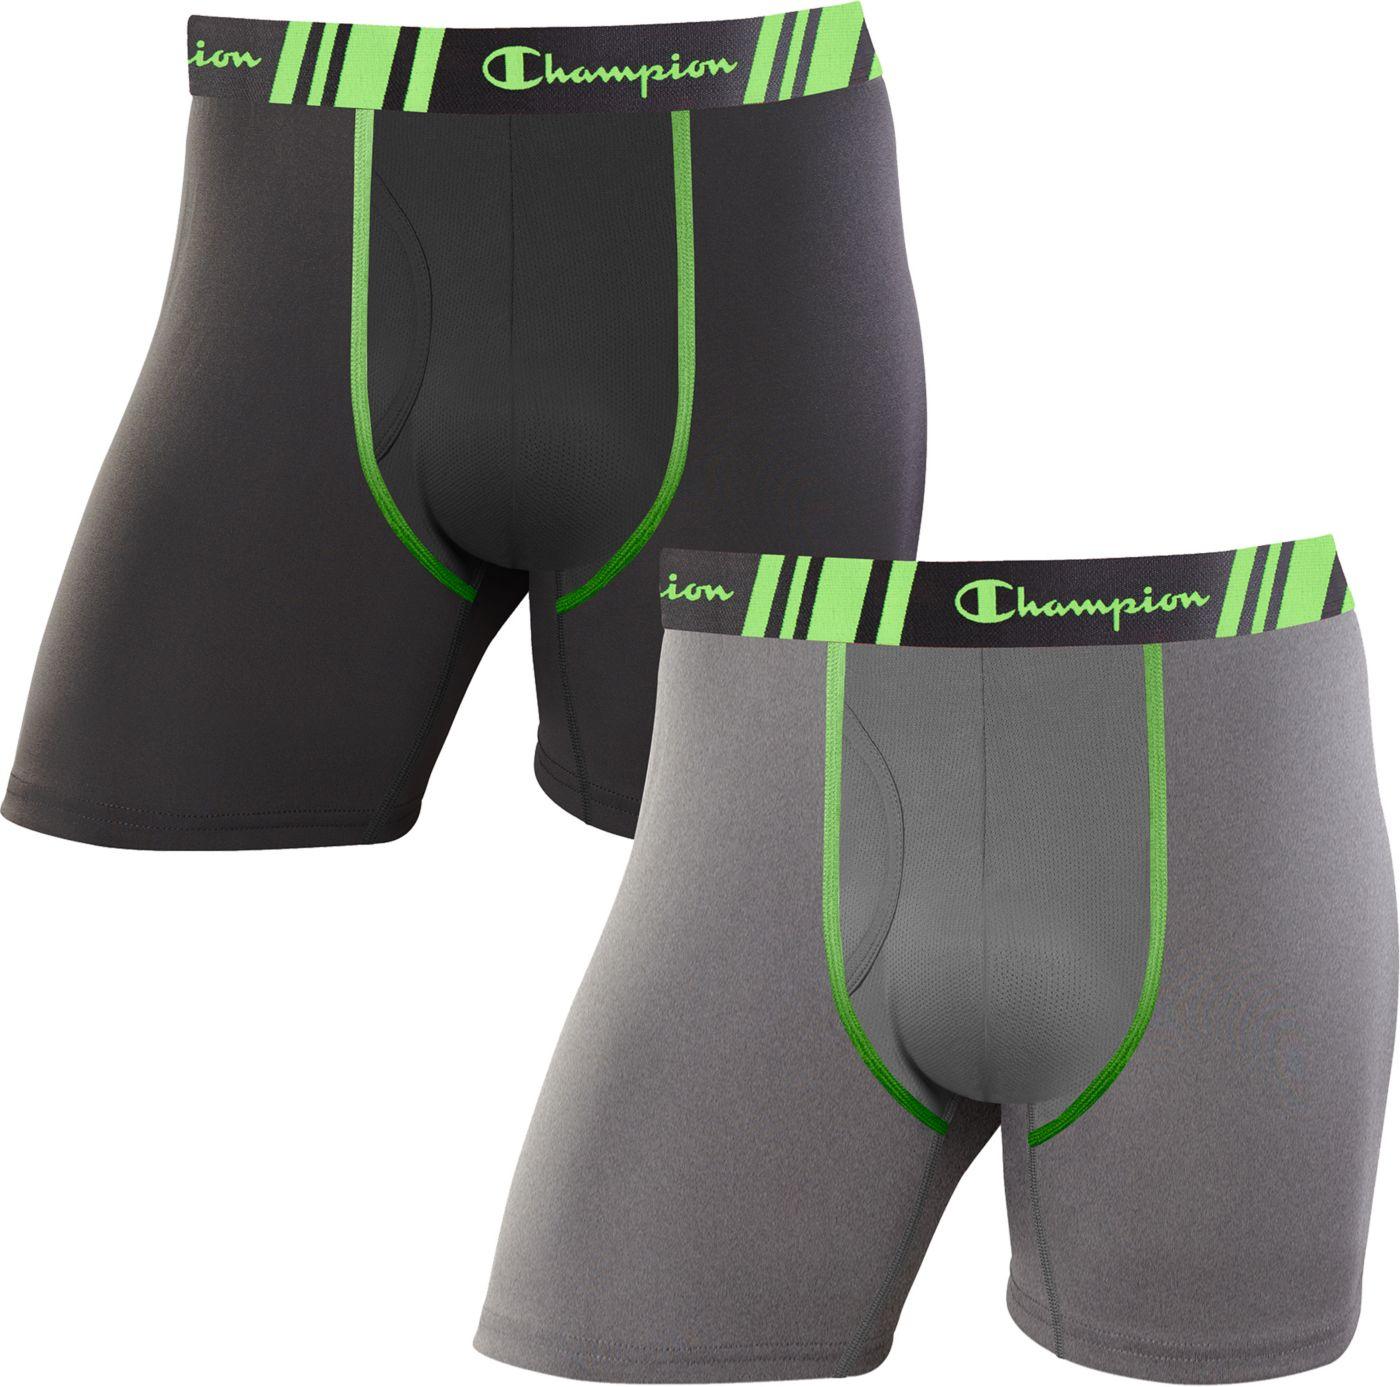 Champion Men's Tech Performance Regular Leg Boxer Briefs – 2 Pack